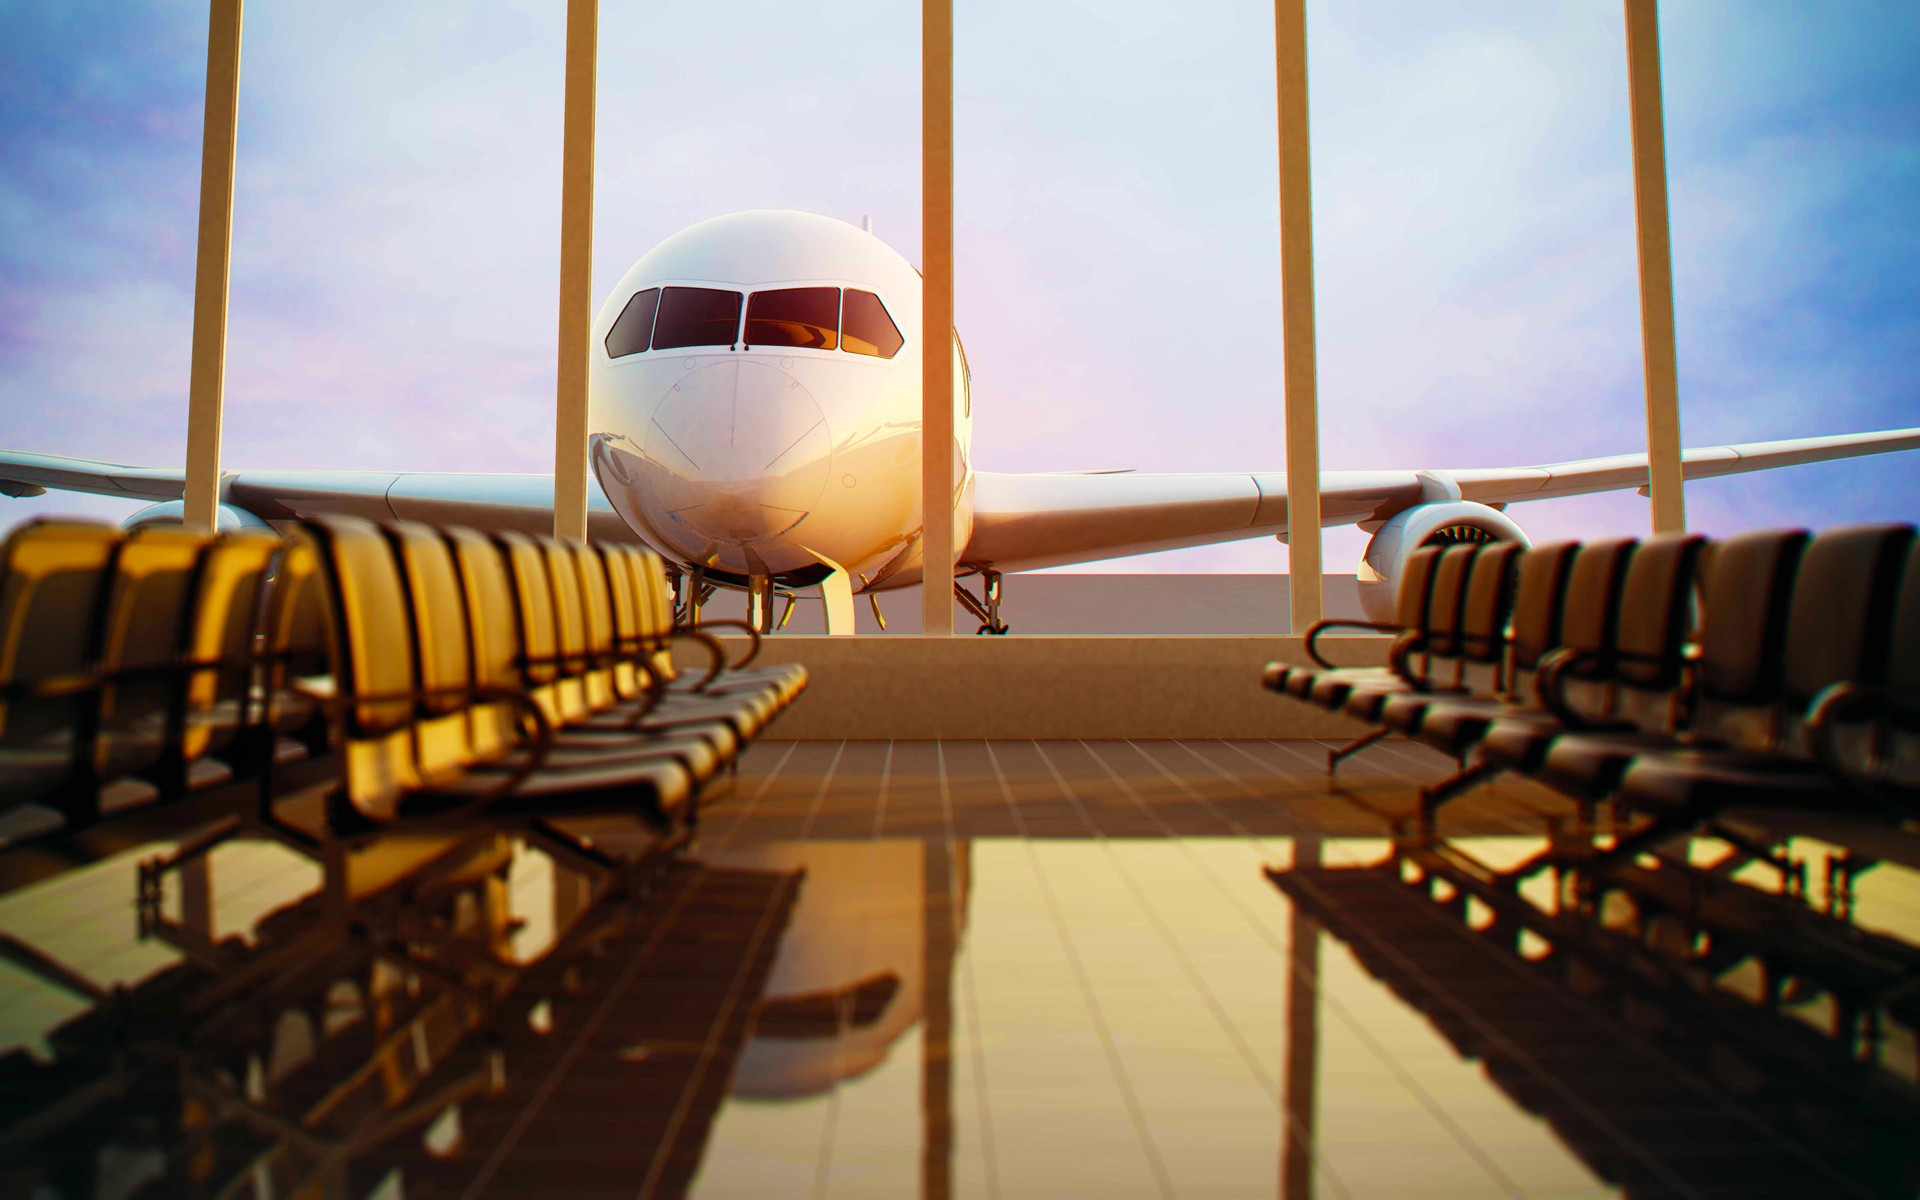 General 1920x1200 airplane passenger aircraft chair airport empty  window tiles clouds reflection sunlight 3D